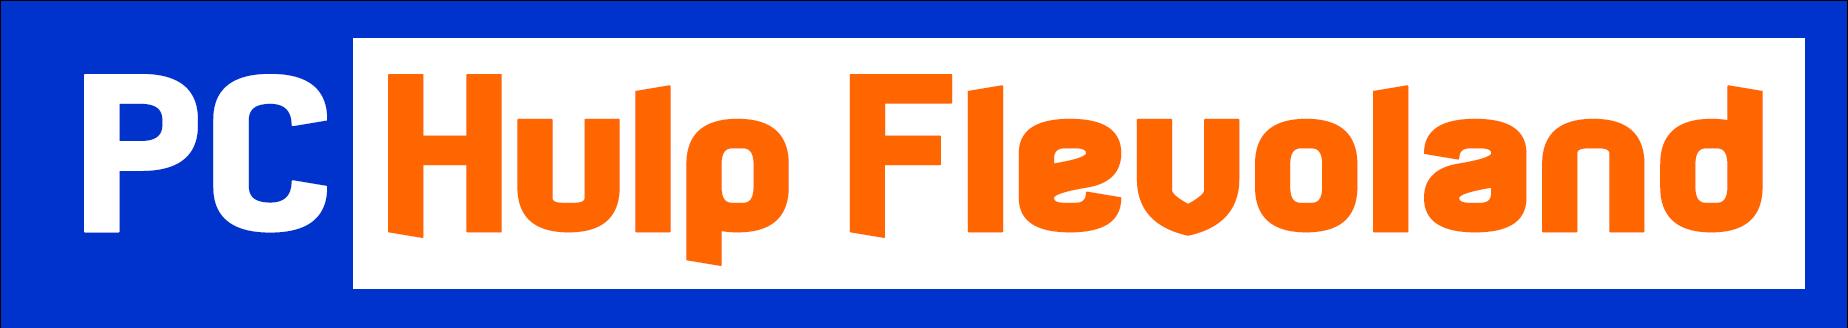 PC Hulp Flevoland